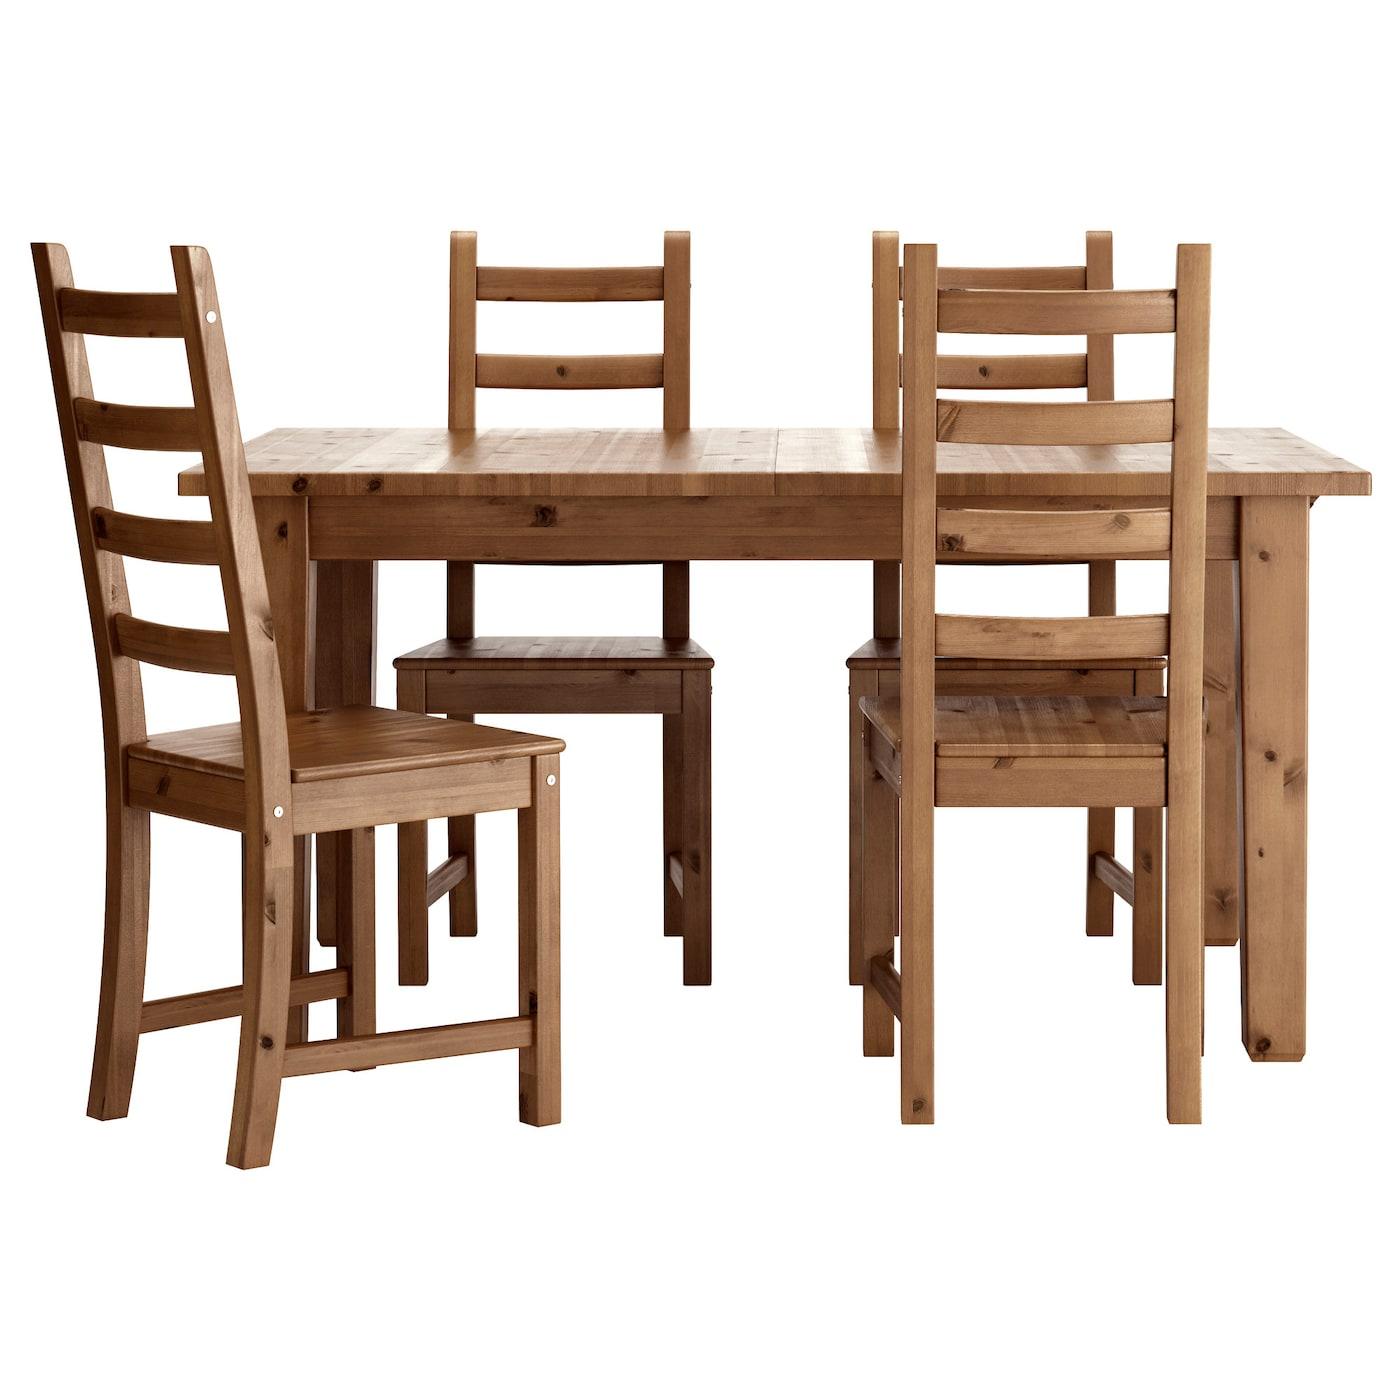 Kaustby storn s tafel en 4 stoelen antiekbeits 147 cm ikea for Ikea kinderstoel en tafel